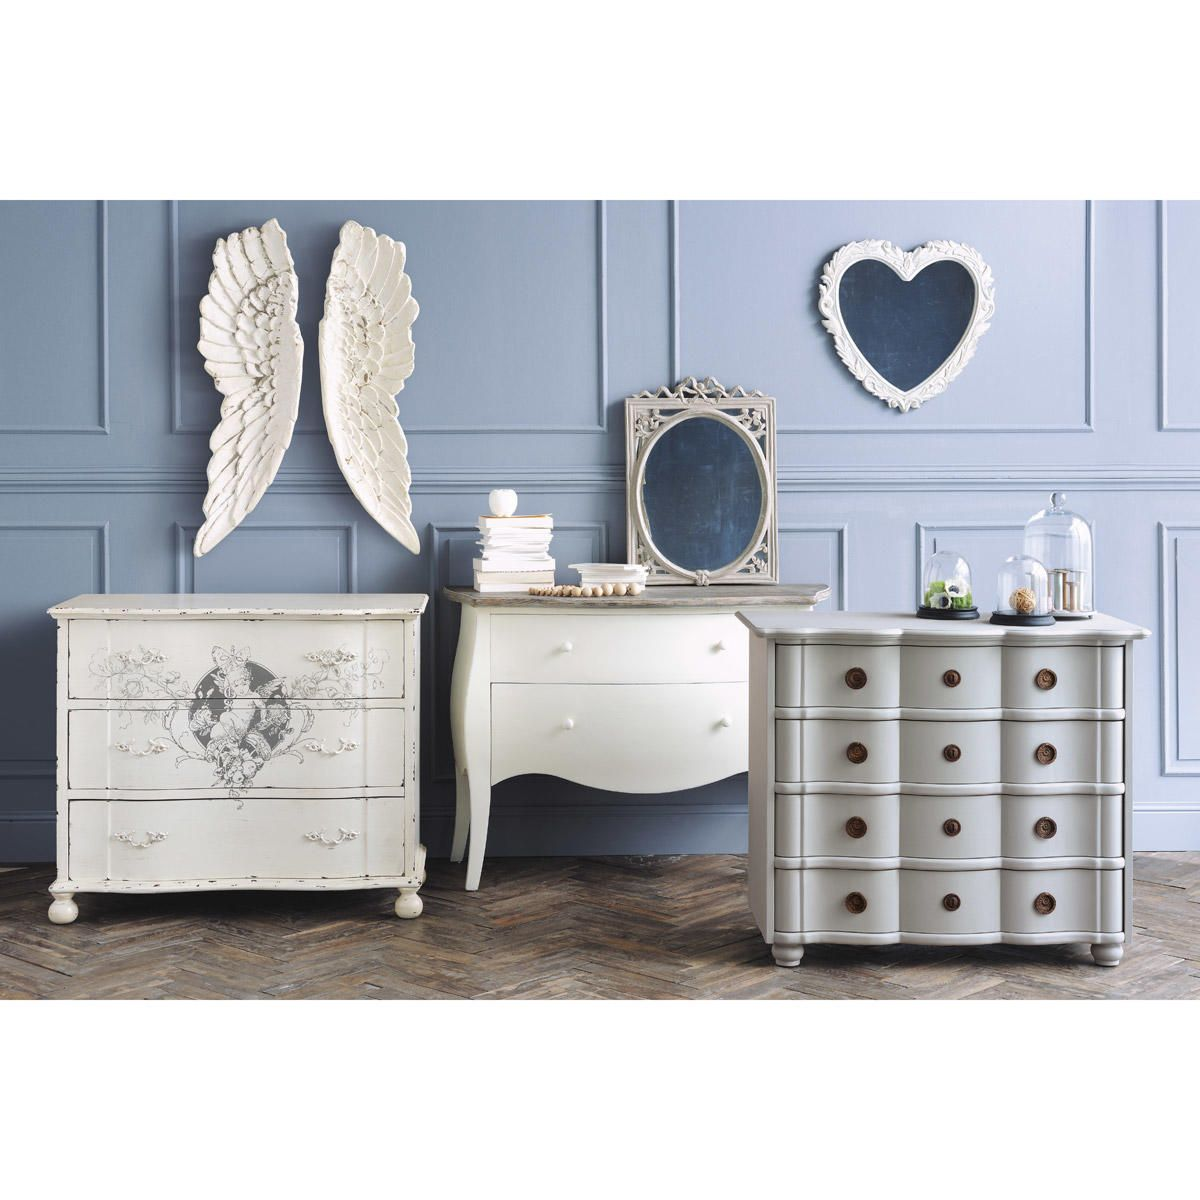 Maisons du monde muebles pintados pinterest c moda for Muebles maison du monde segunda mano